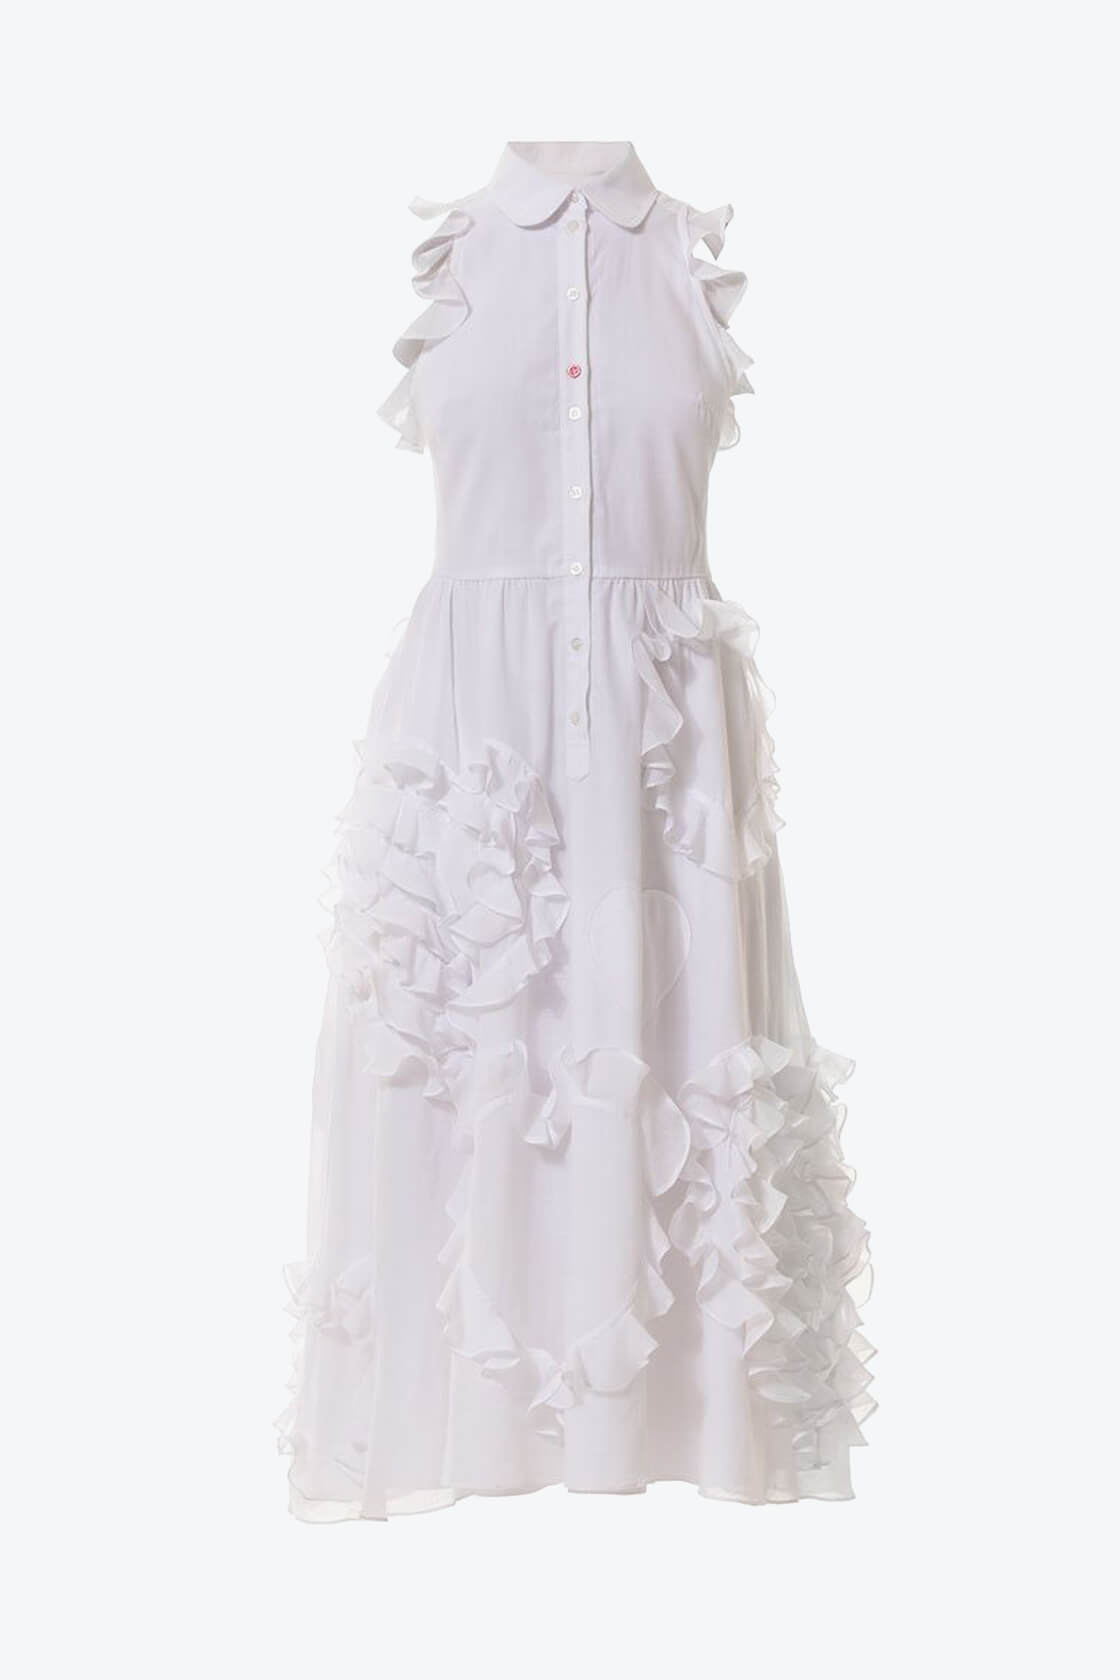 OL10000215 Ruffled hearts batiste A line dress1